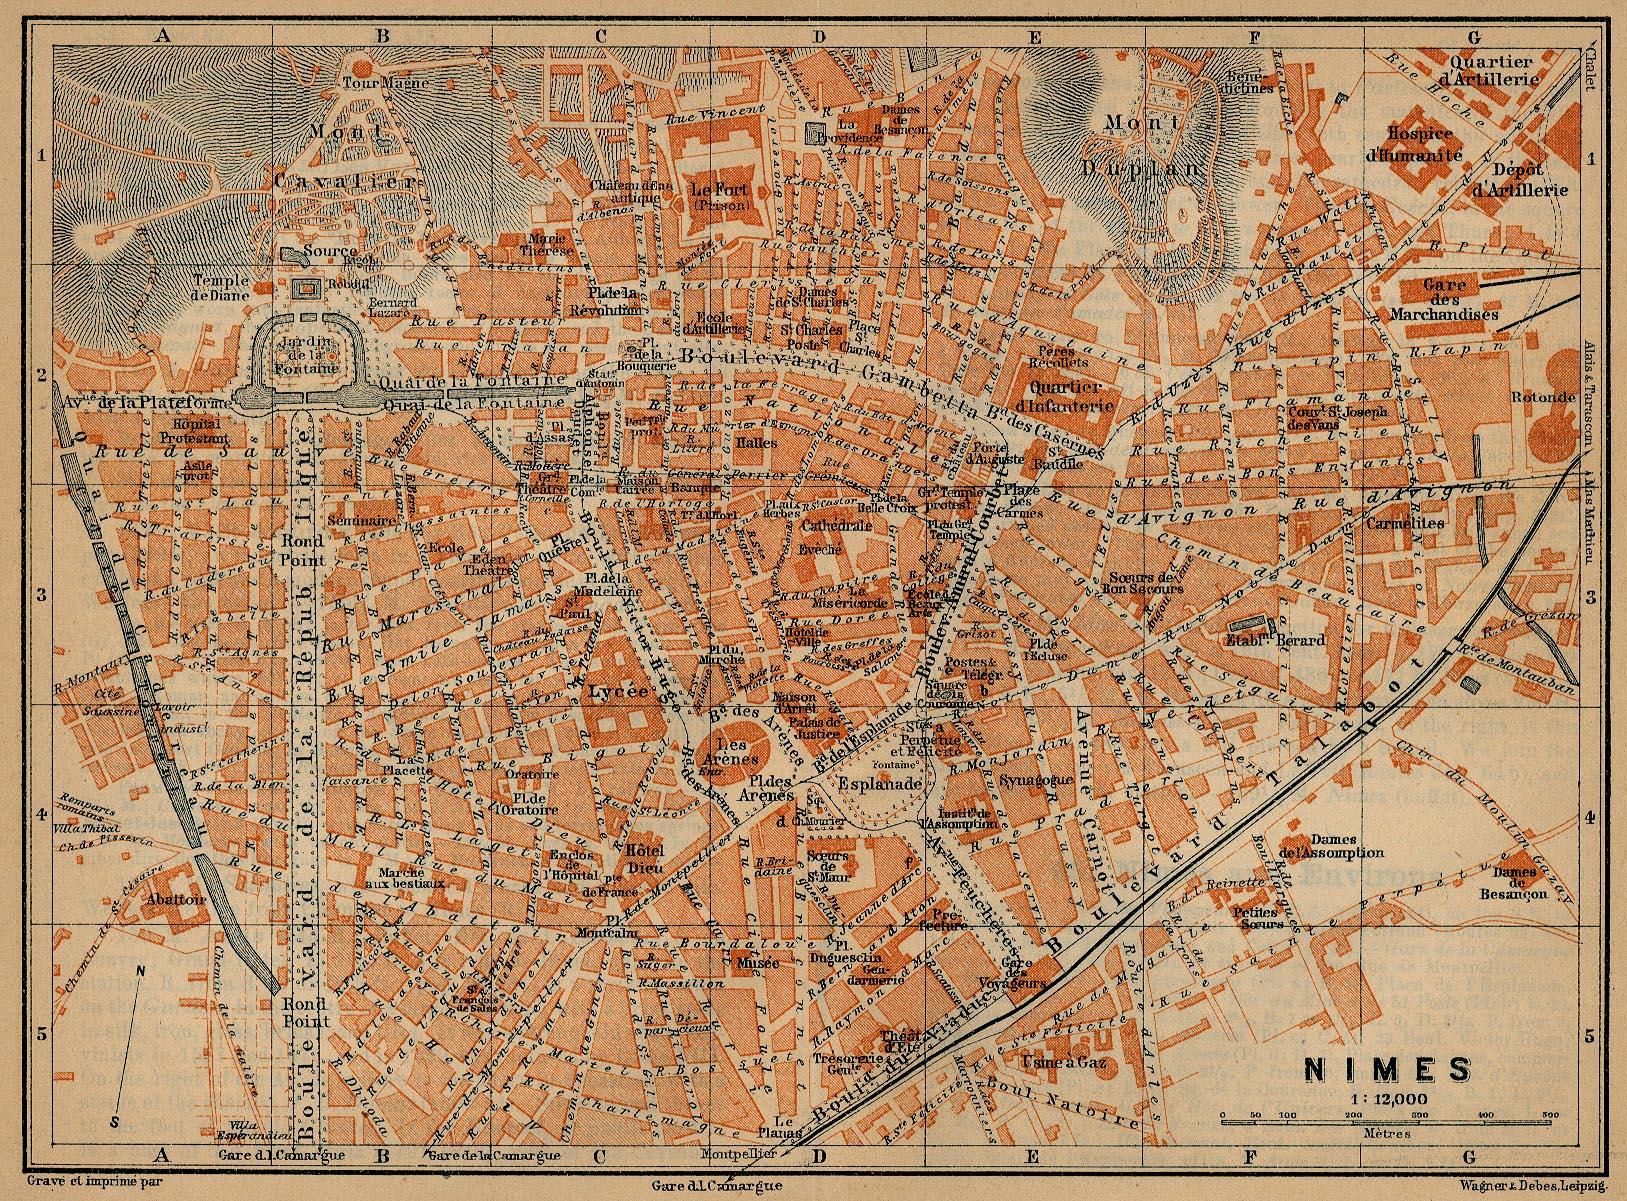 Mapa de Nimes, Francia 1914